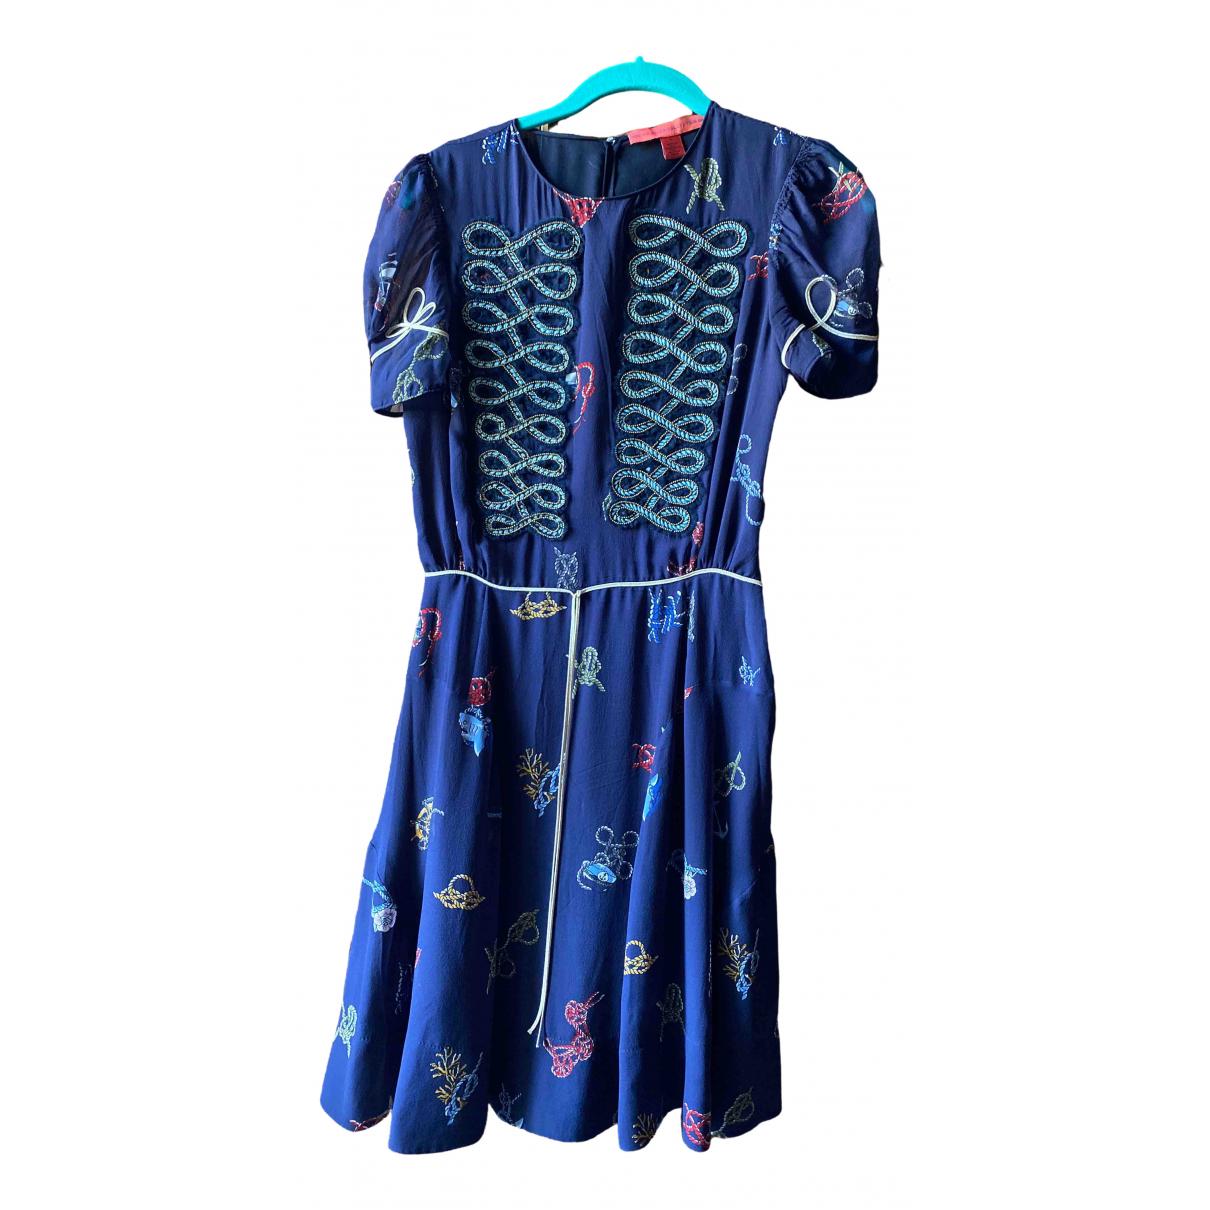 Hilfiger Collection \N Kleid in  Blau Viskose